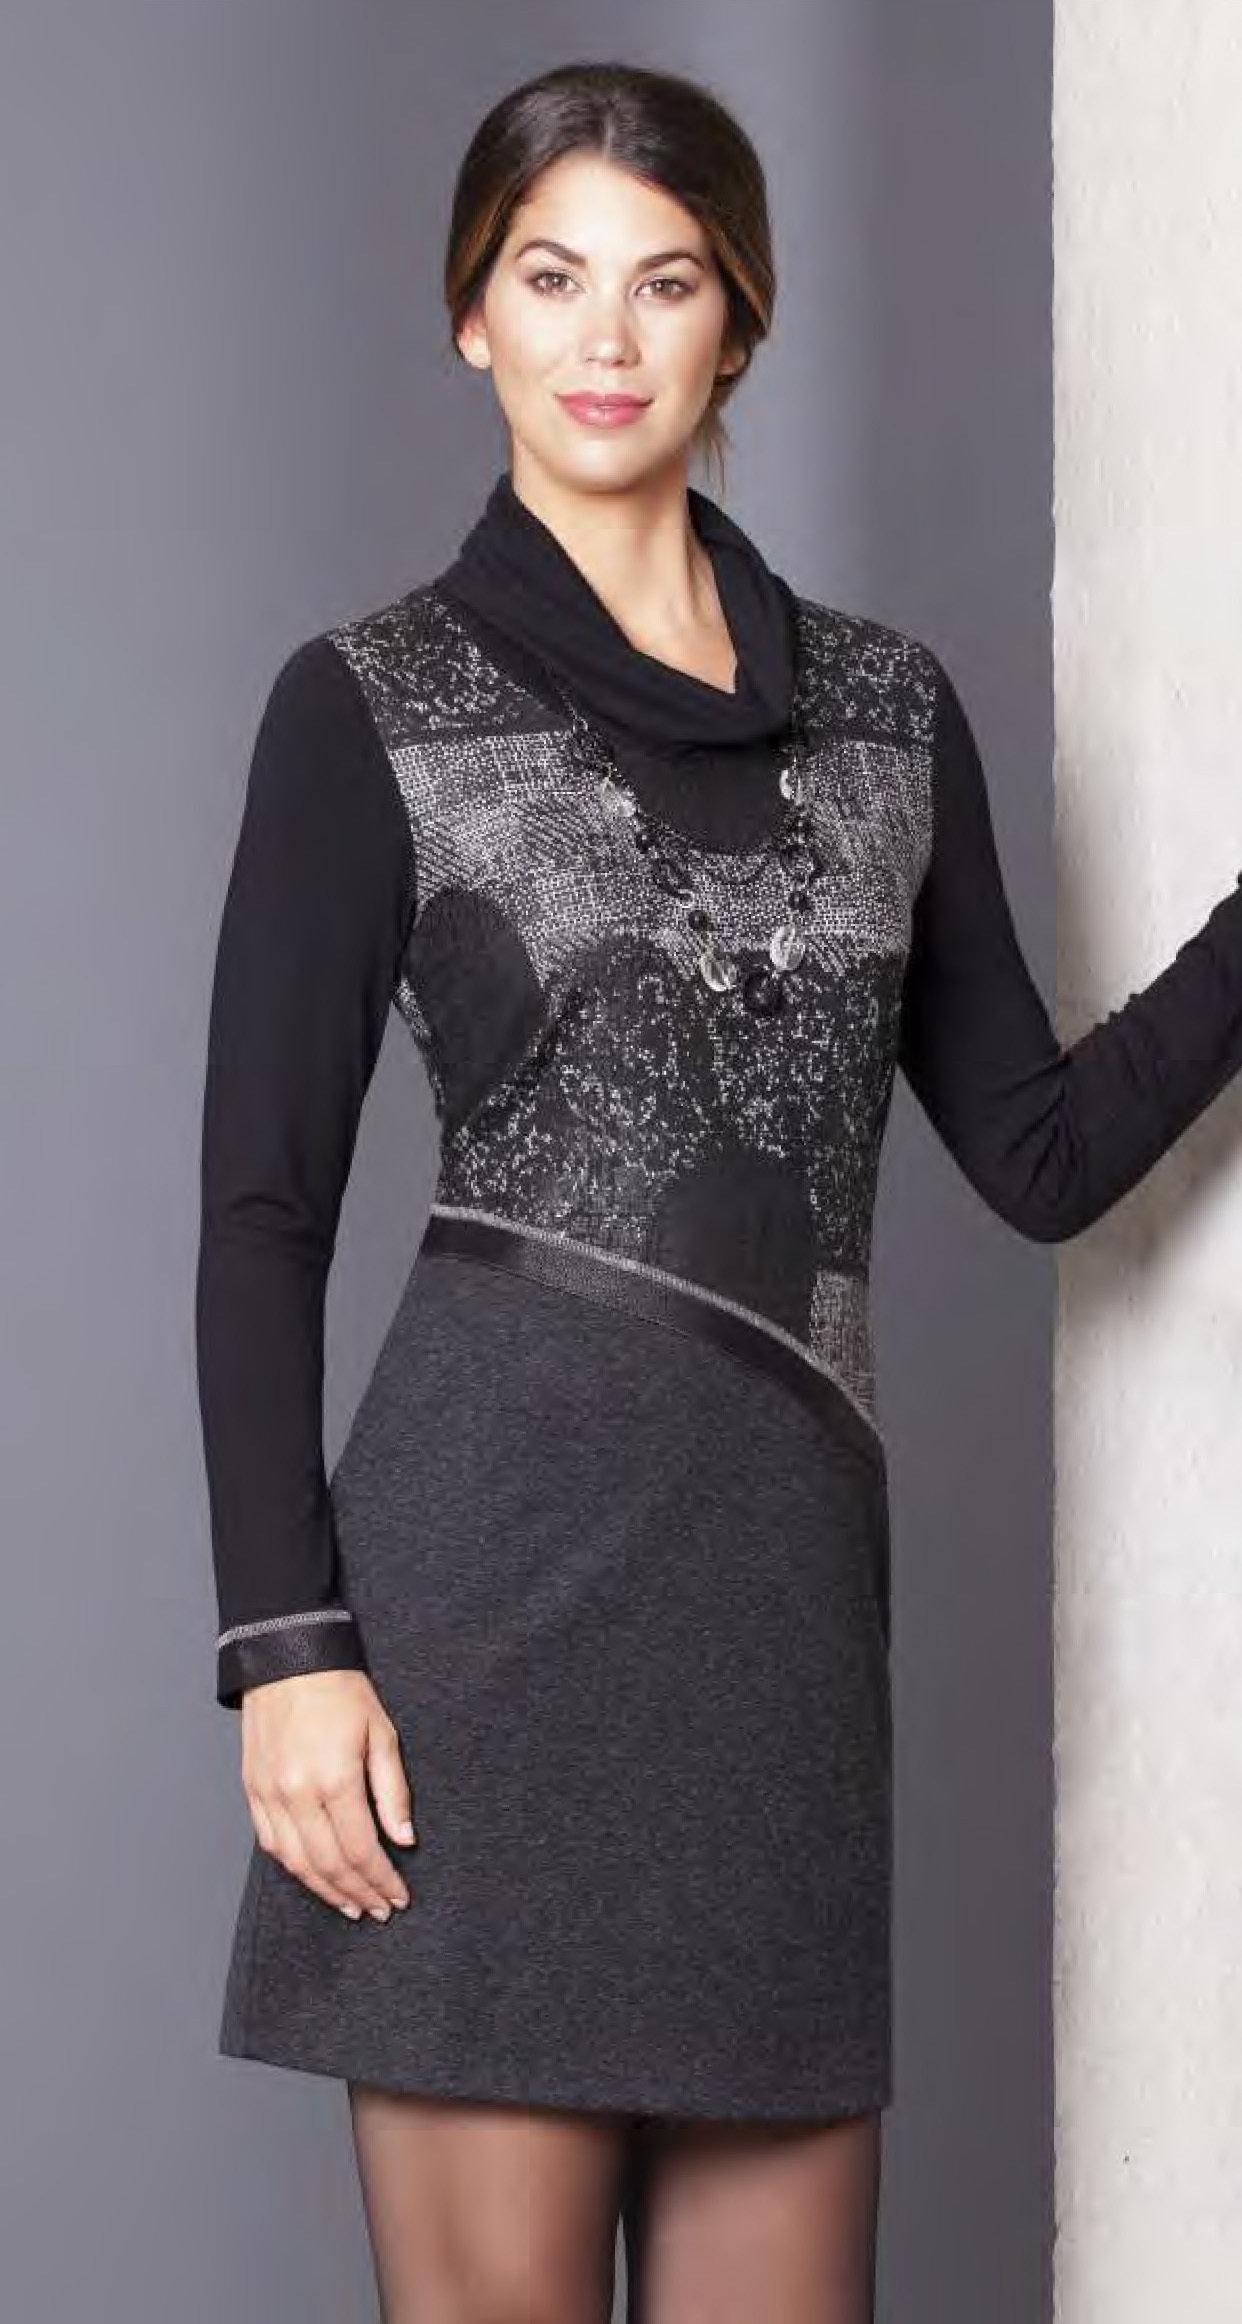 Dolcezza: Asymmetrical Ribboned Waist Dress/Tunic (1 Left!) DOLCEZZA_58105_N